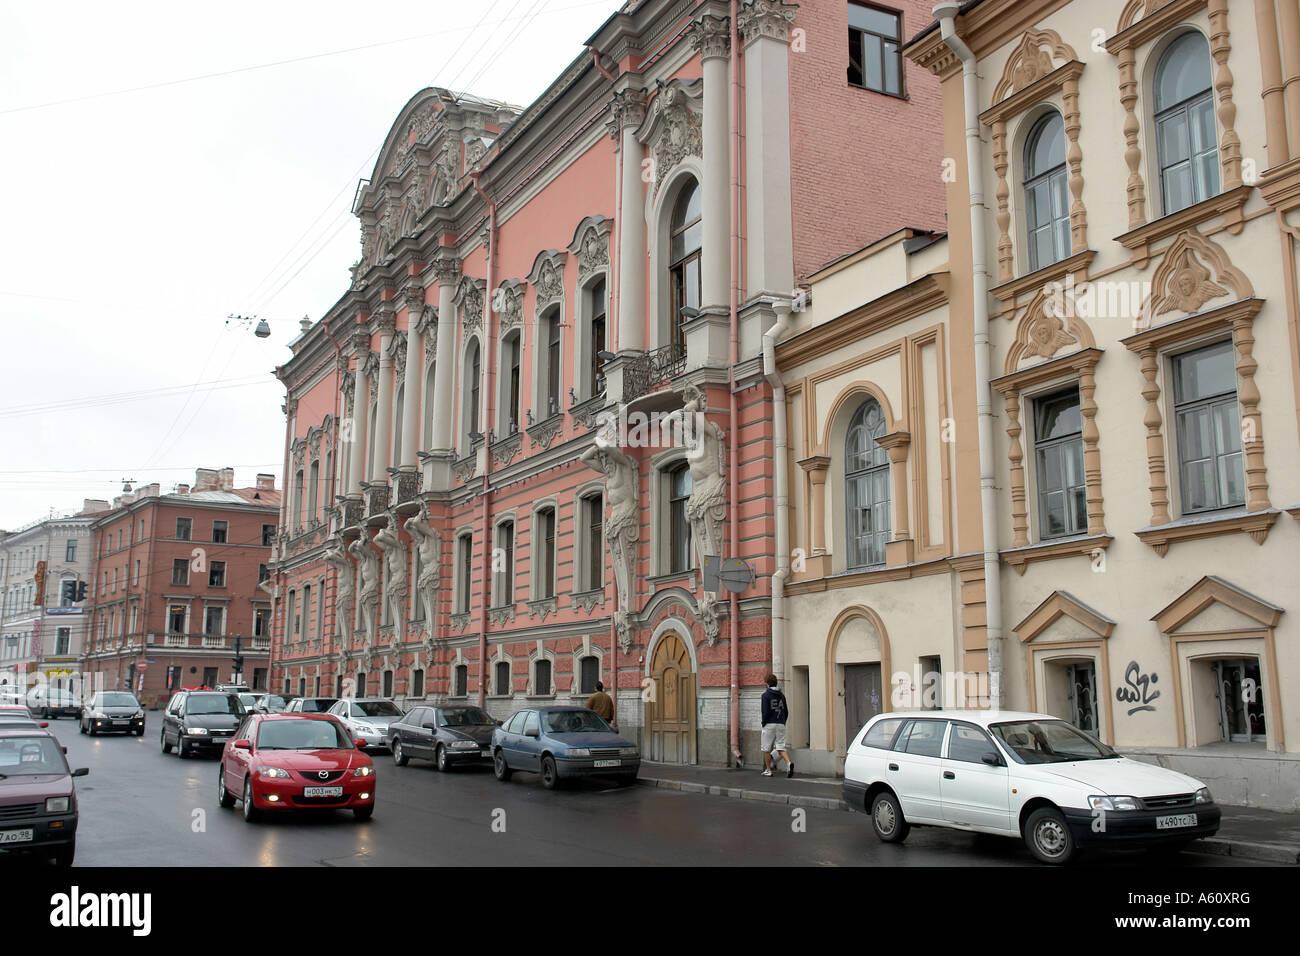 Painet JJ1944 russia beloselskiybelozerkiy palace rococco Capolavoro costruito andrey stakenschneider metà Immagini Stock